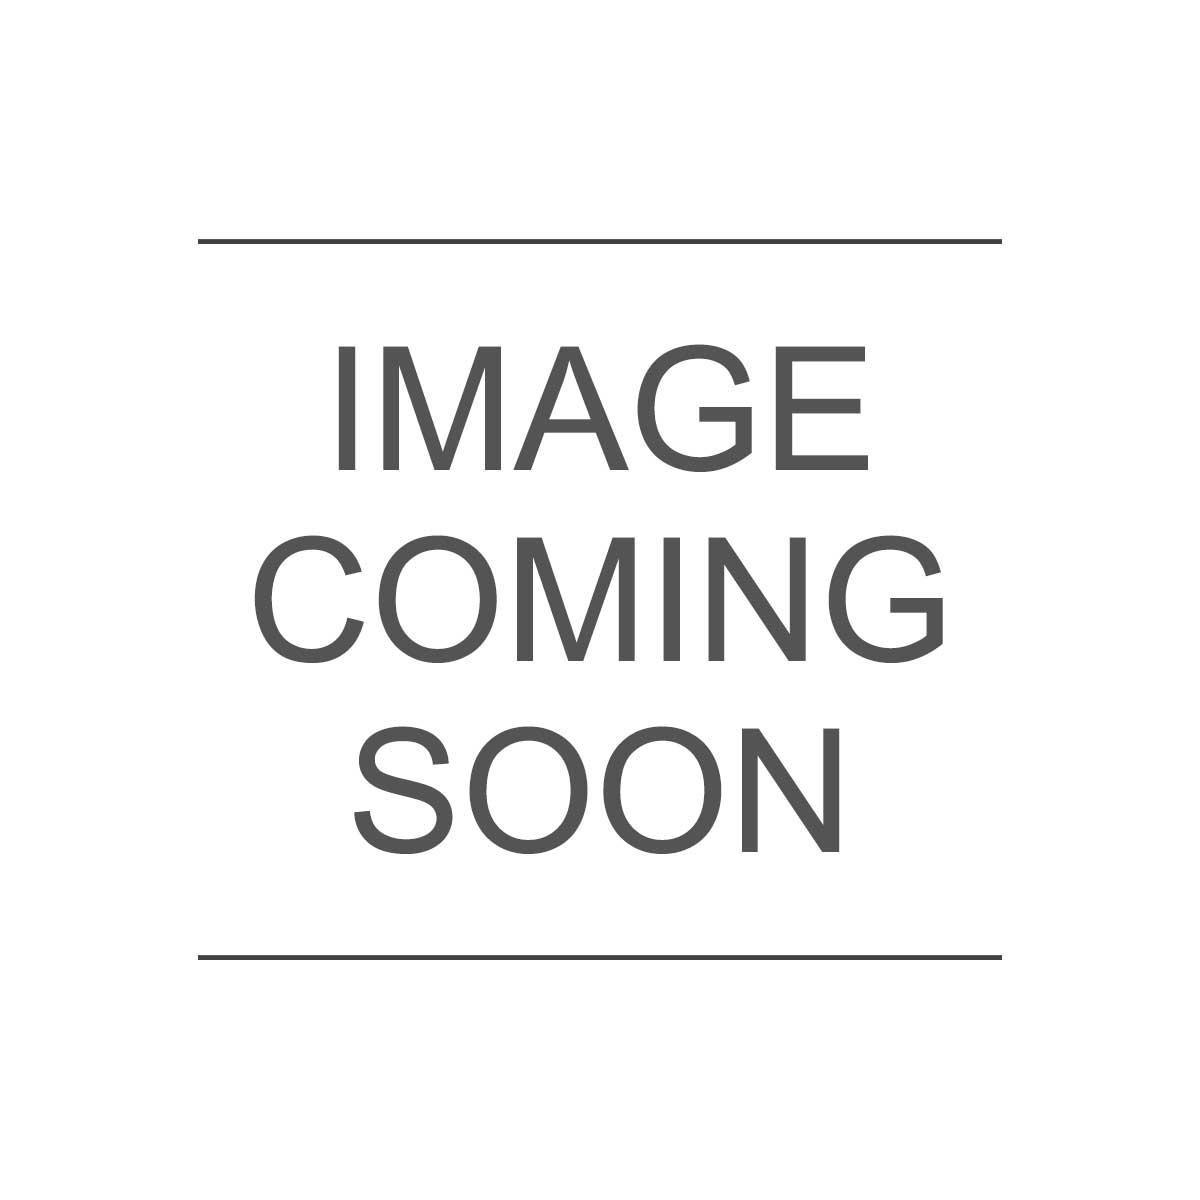 reCAP® Mason Jars Lid ADAPTA Pour Tap, Regular Mouth, Black - Case of 6